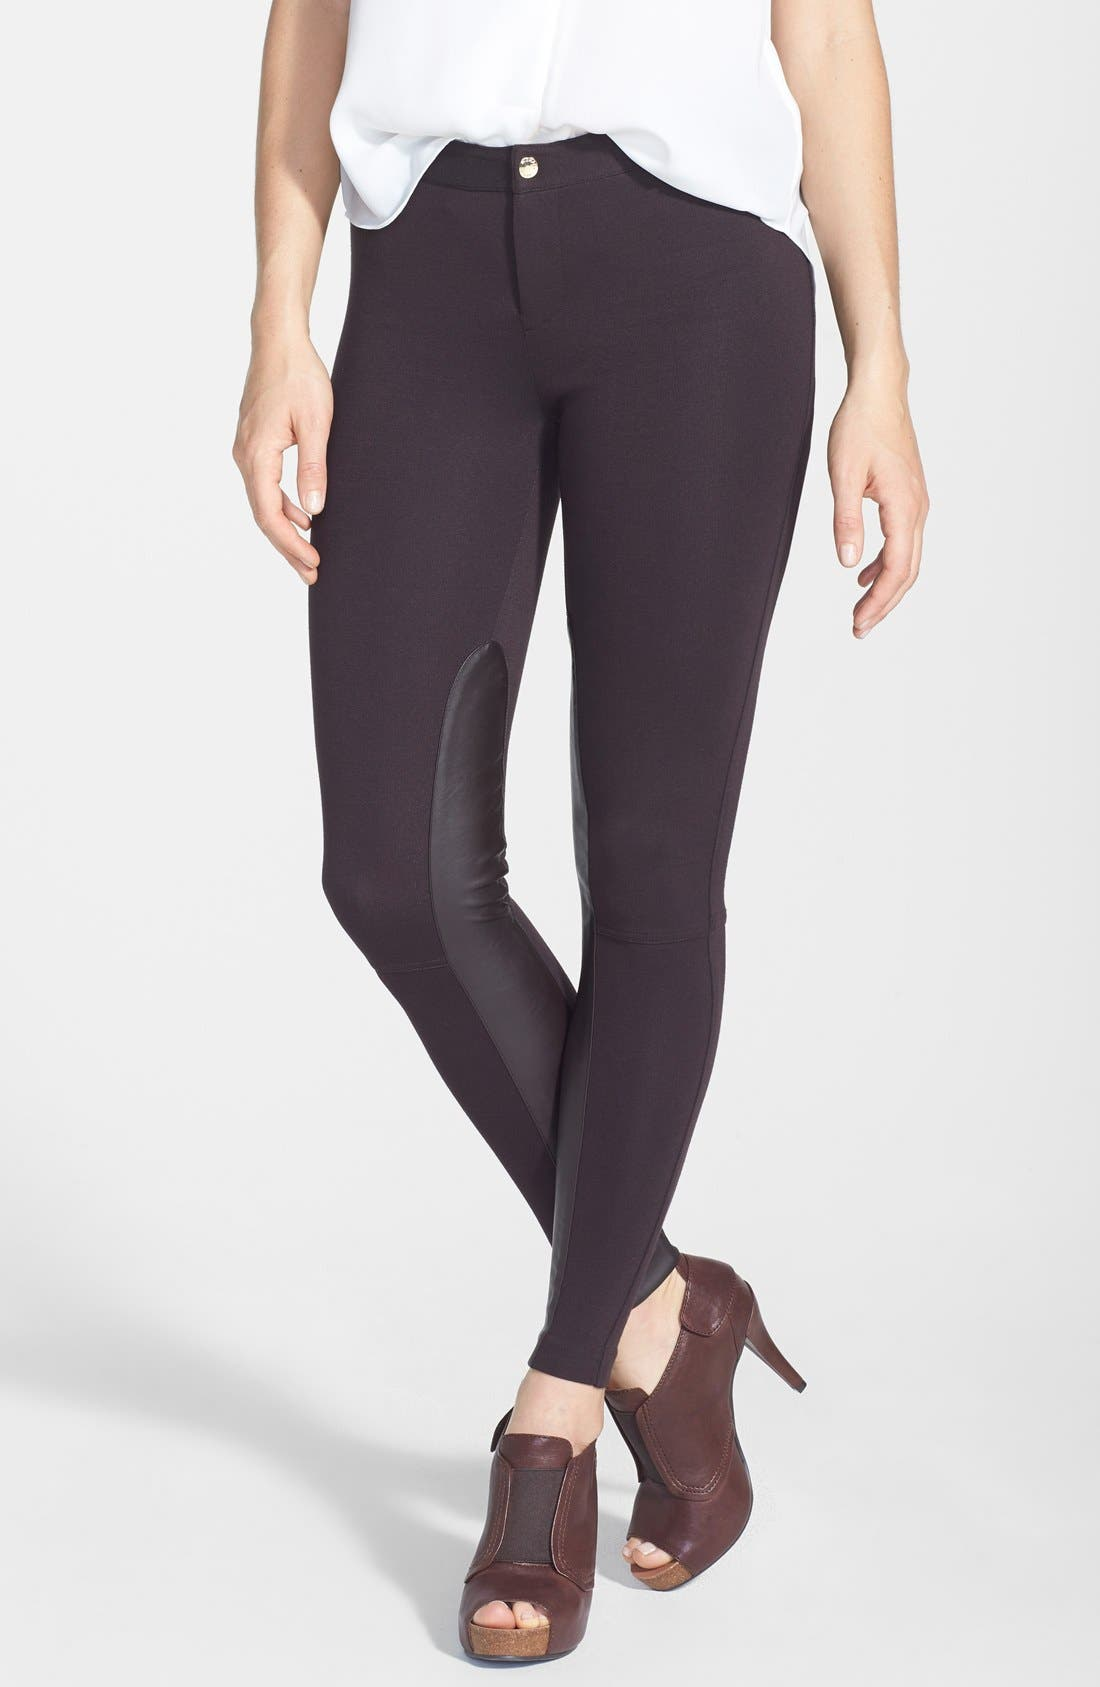 Alternate Image 1 Selected - MICHAEL Michael Kors Faux Leather Panel Seamed Pants (Regular & Petite)